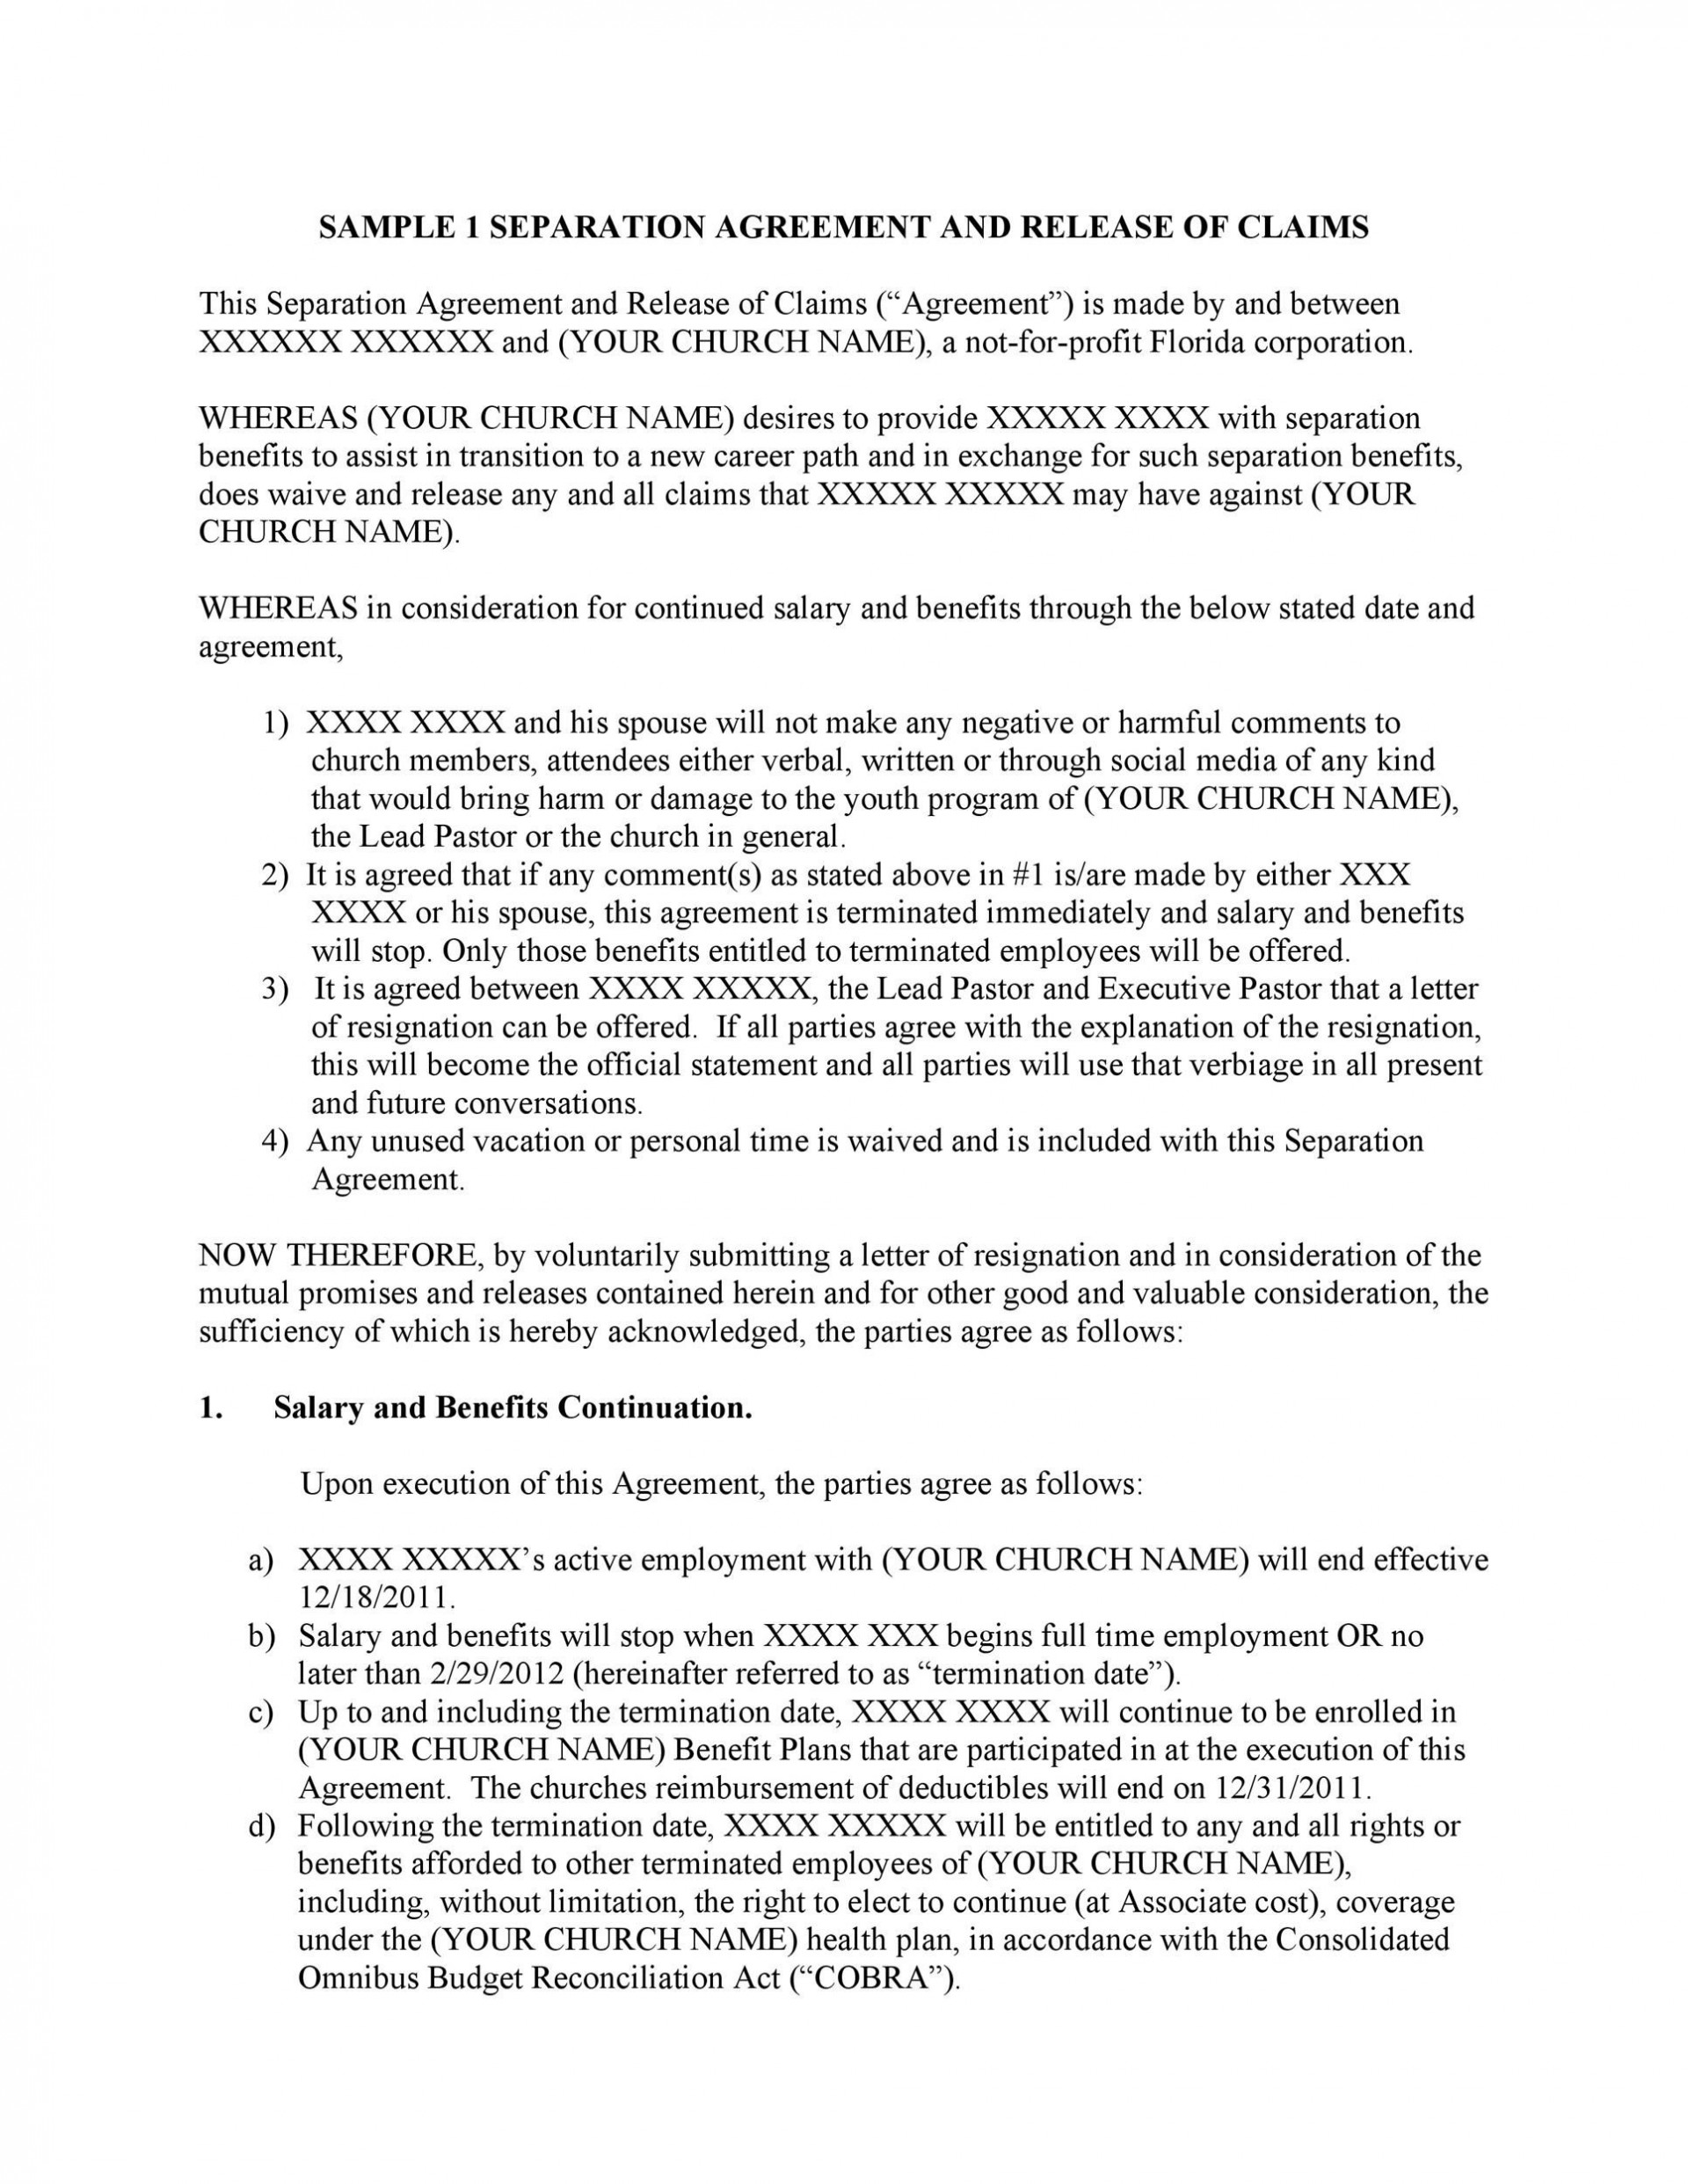 007 Unbelievable Busines Partnership Separation Agreement Template Inspiration  Partner Termination1920